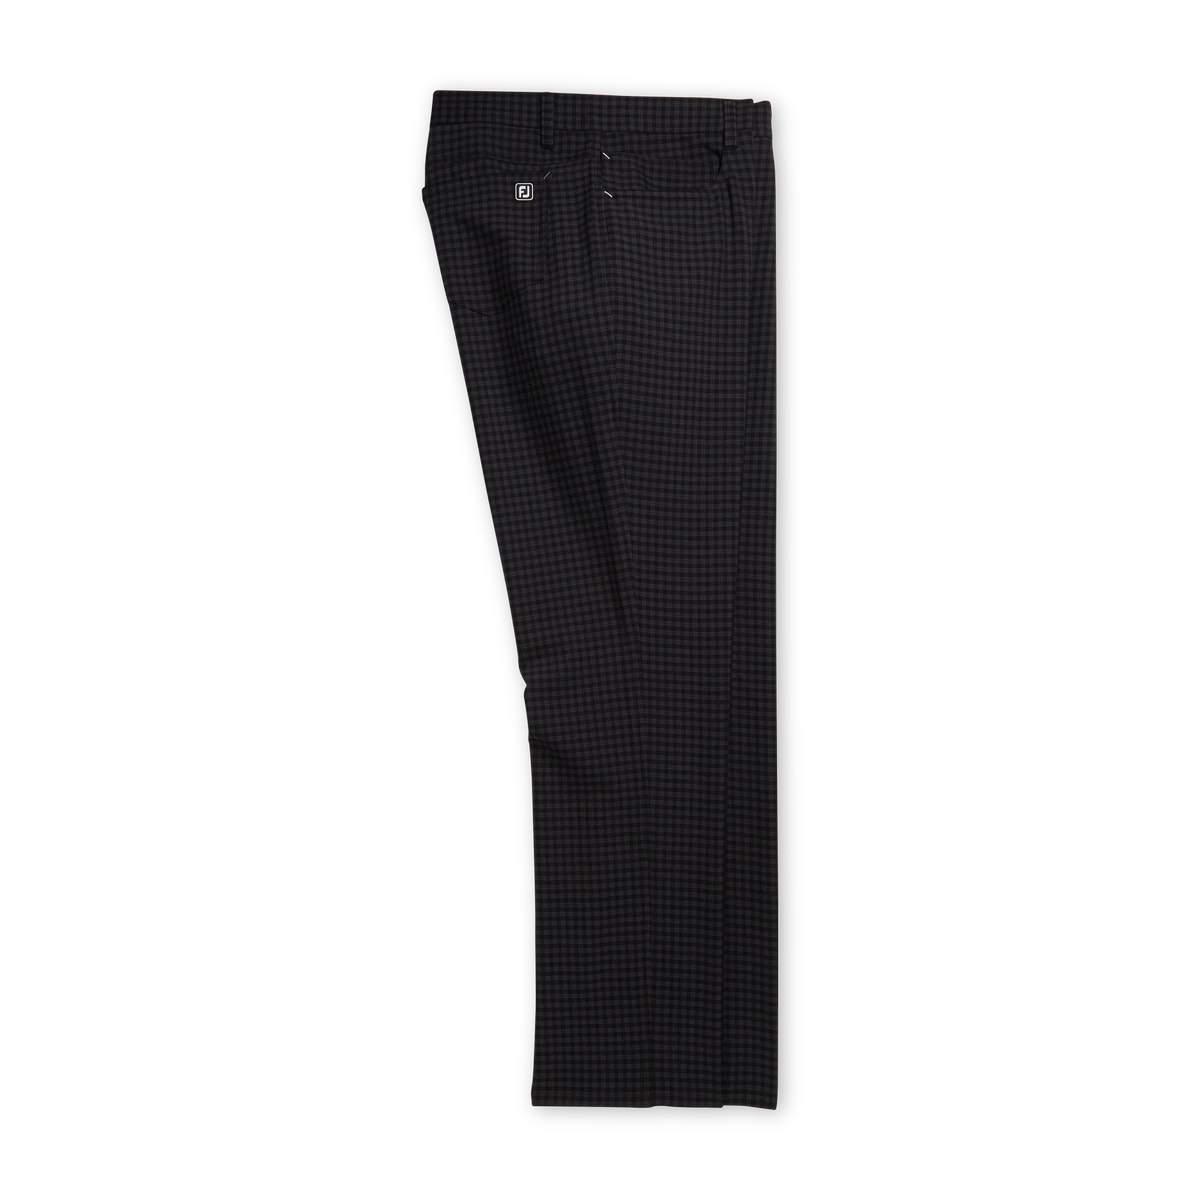 FootJoy Men's 5-Pocket Plaid Charcoal Pants